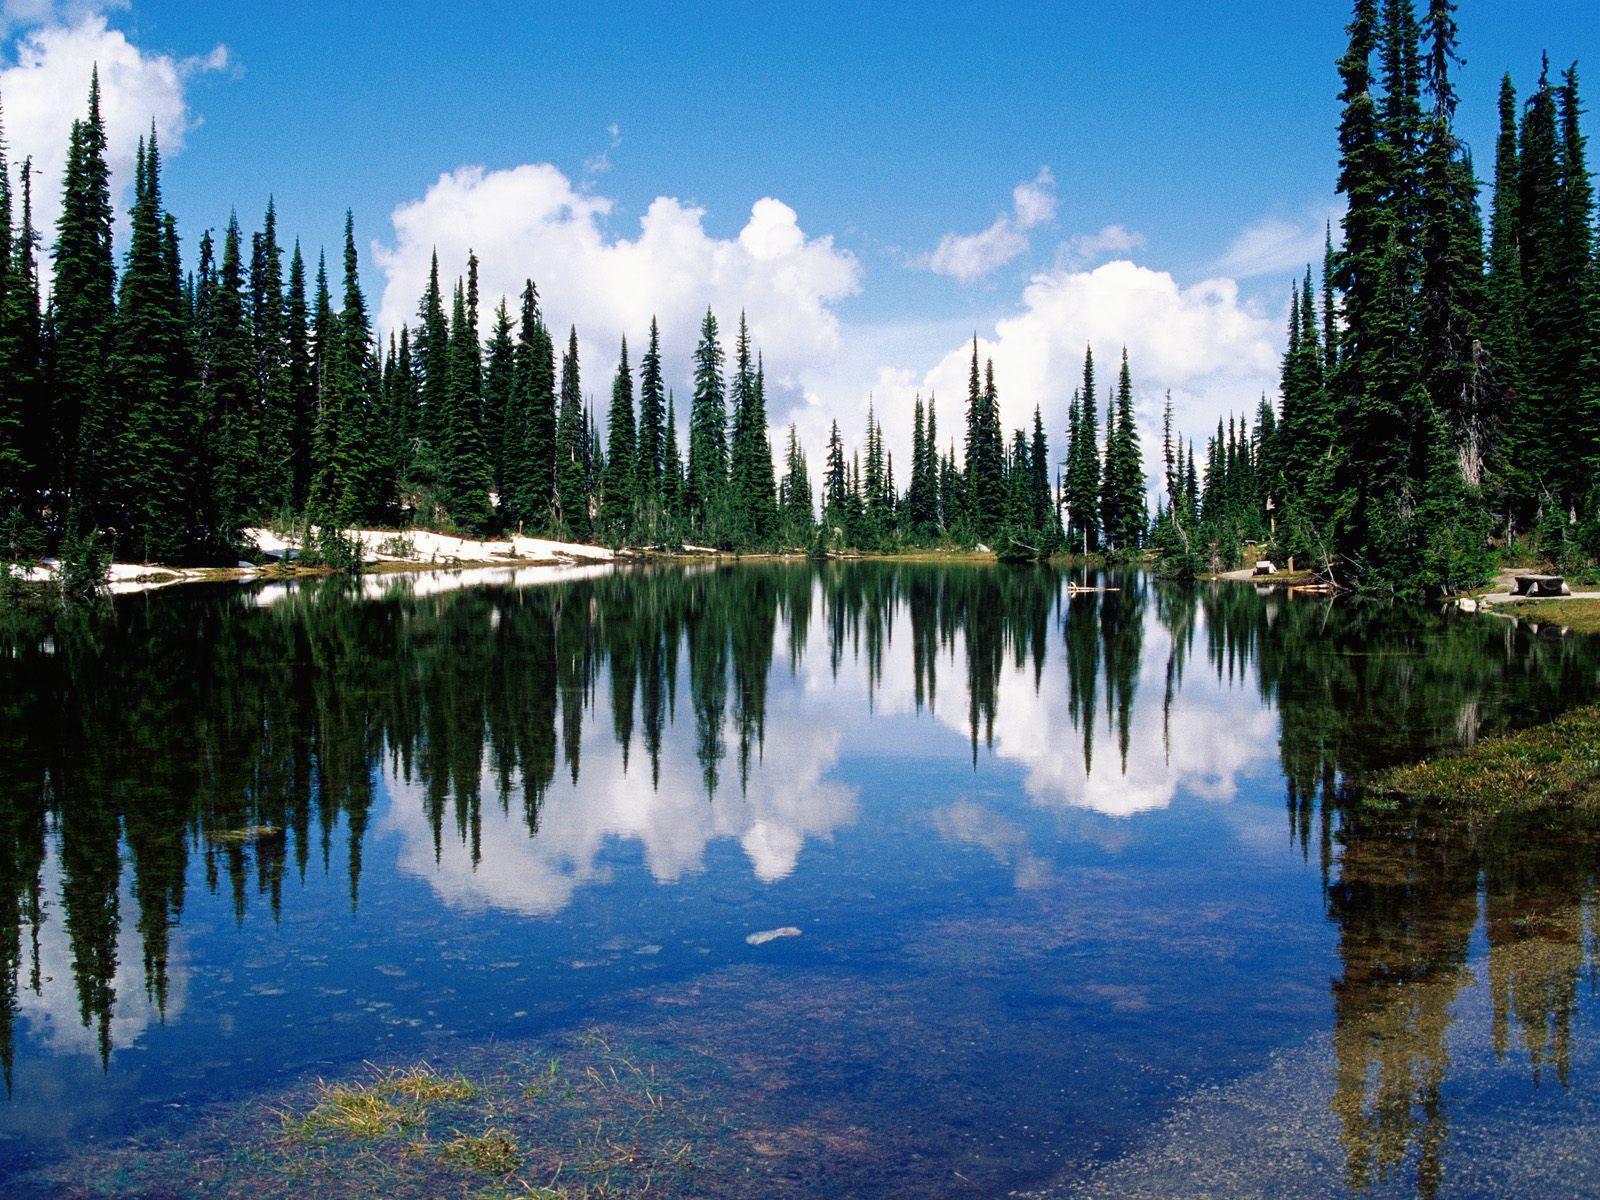 Balsam Lake, Mount Revelstoke National Park, British Columbia, Canada